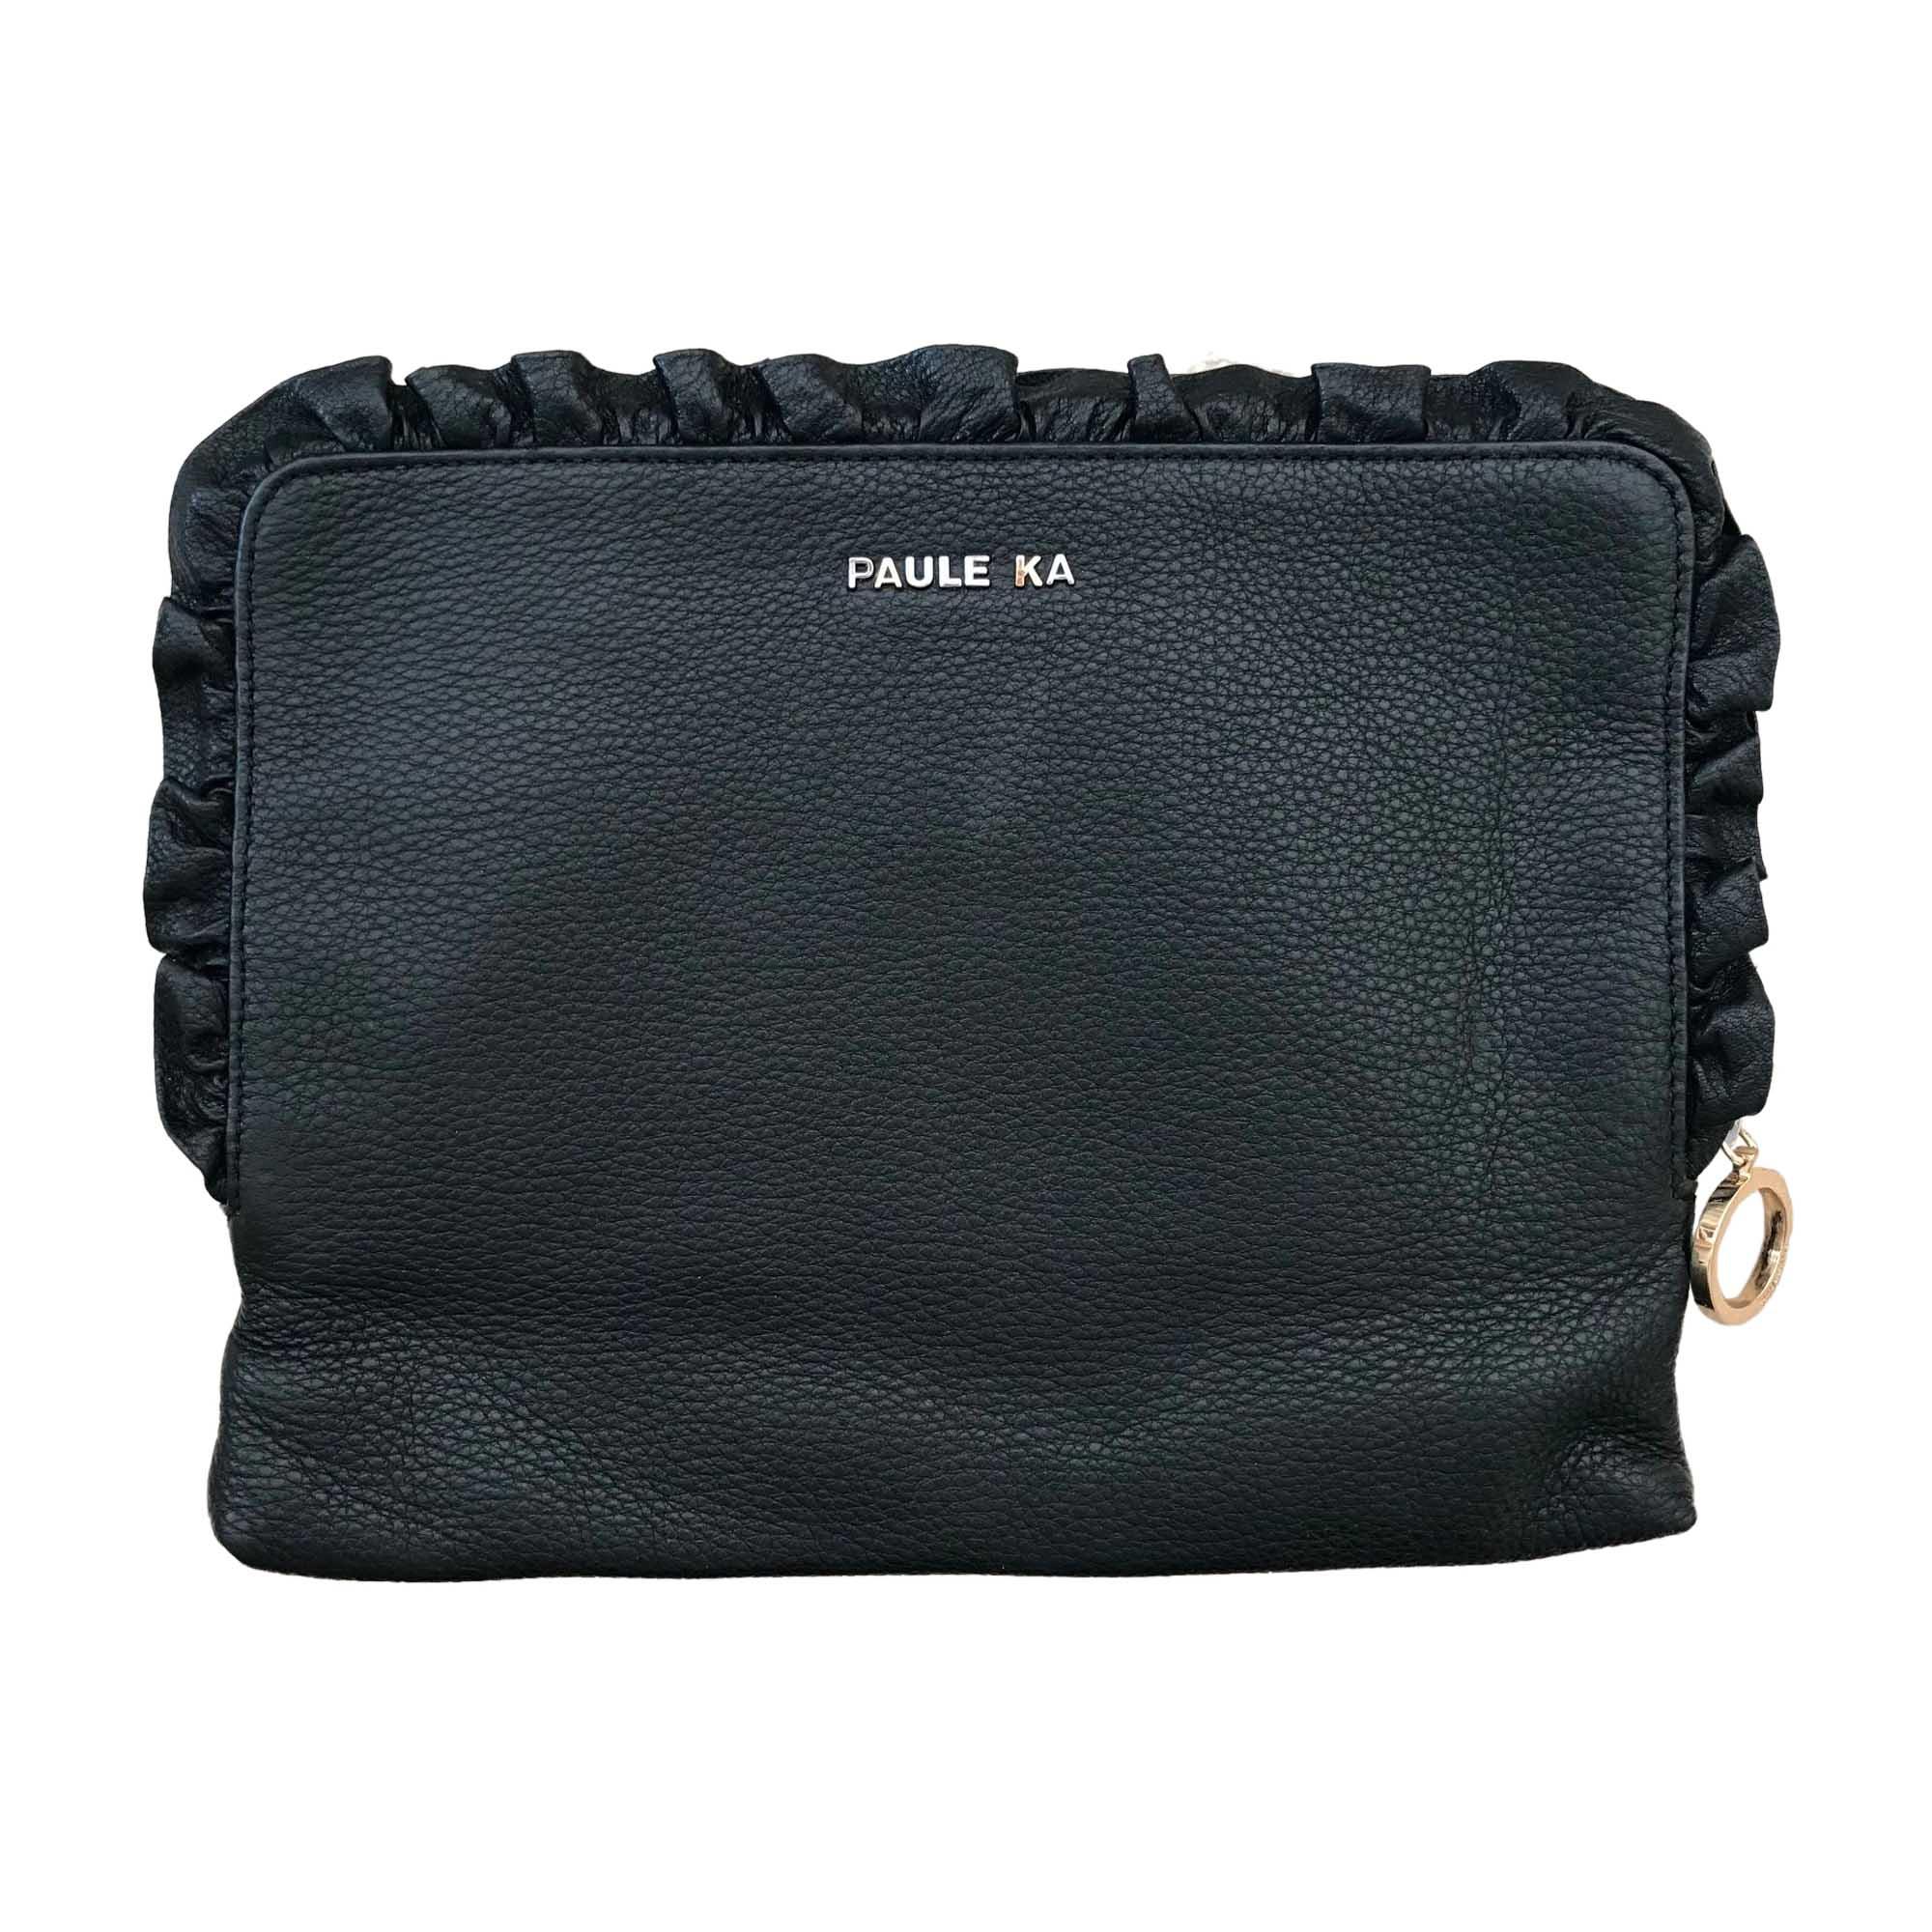 Pochette PAULE KA cuir noir